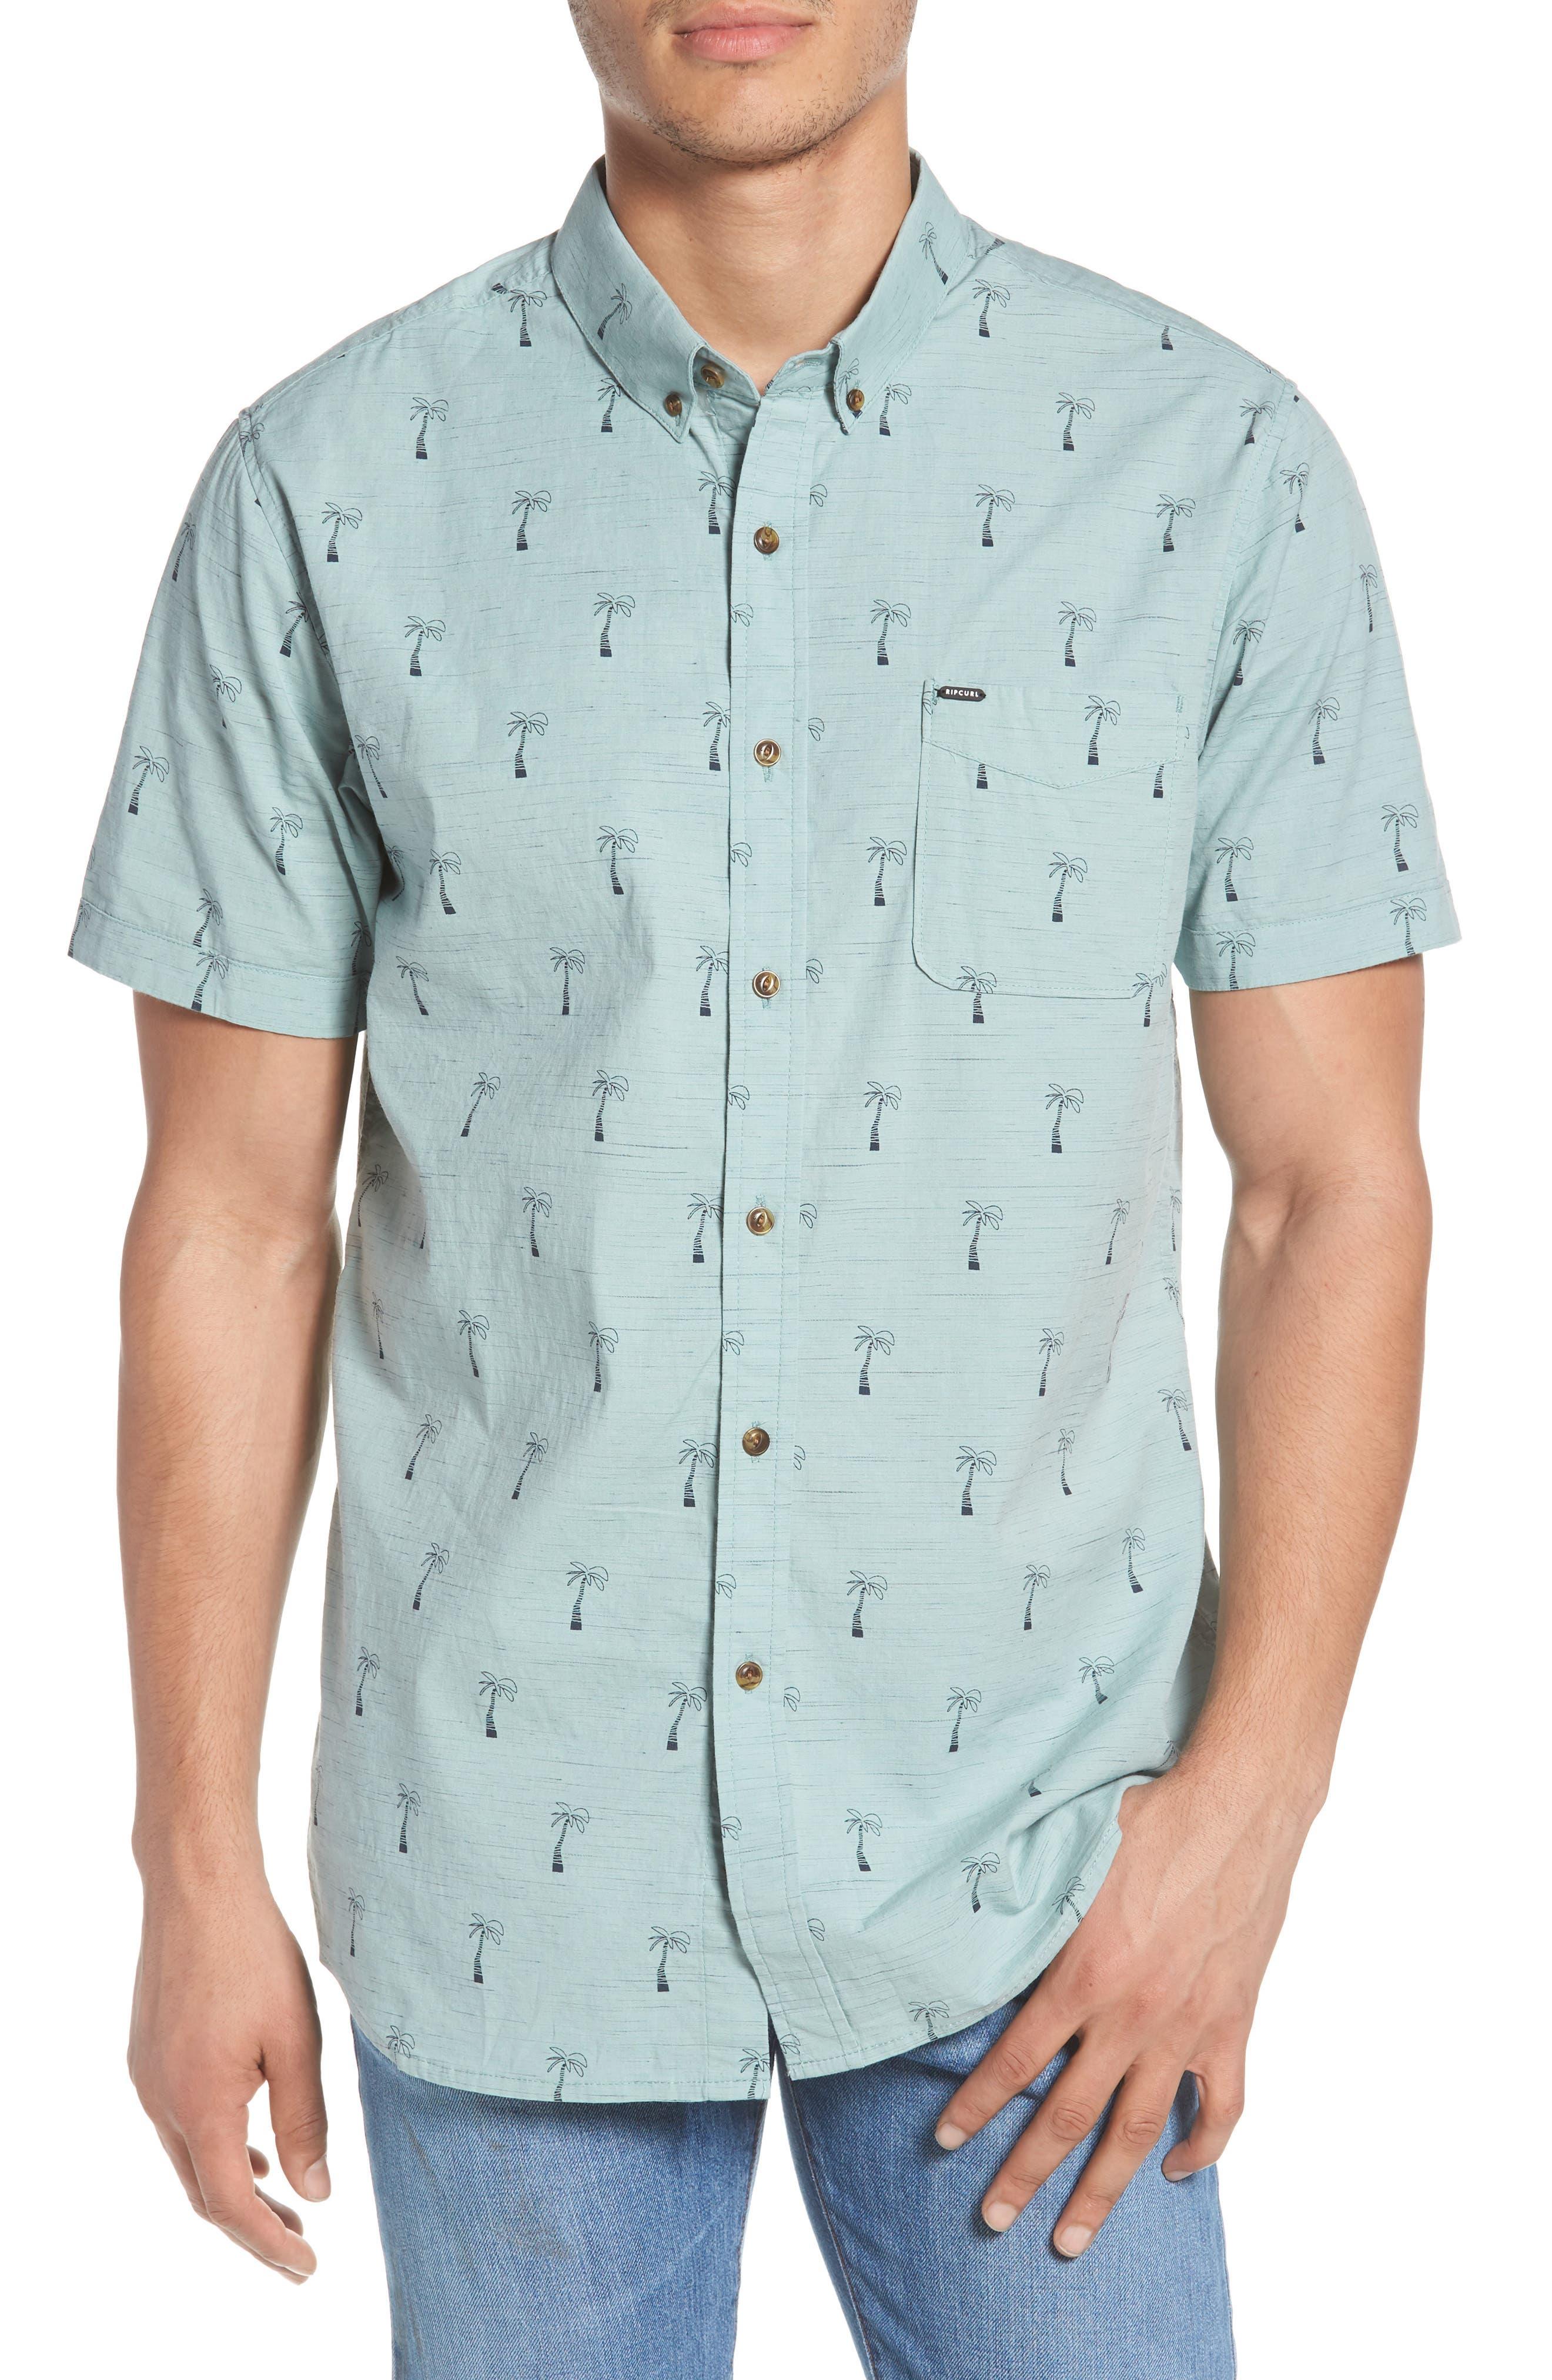 Riviera Woven Shirt,                             Main thumbnail 1, color,                             Aqua